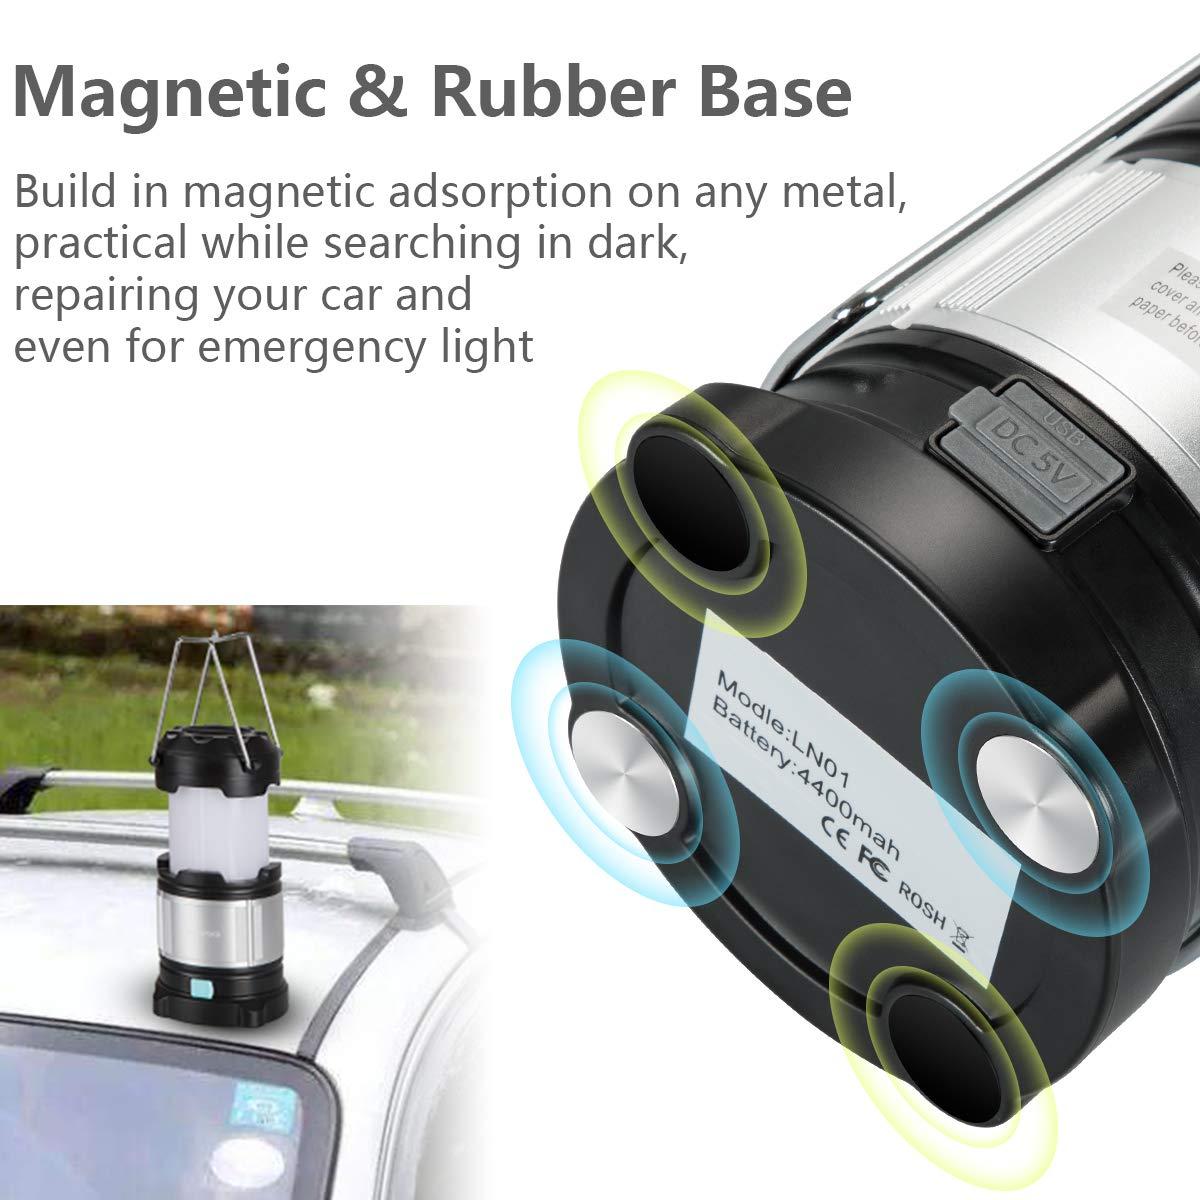 4 Light Modes for Camping//Fishing IPX5 Waterproof Portable LED Lantern Rechargeable Camping Lamp Lightweight Led USB Lamp Flashlight 4400mAh Power Bank Homealexa LED Camping Lantern Emergency Light